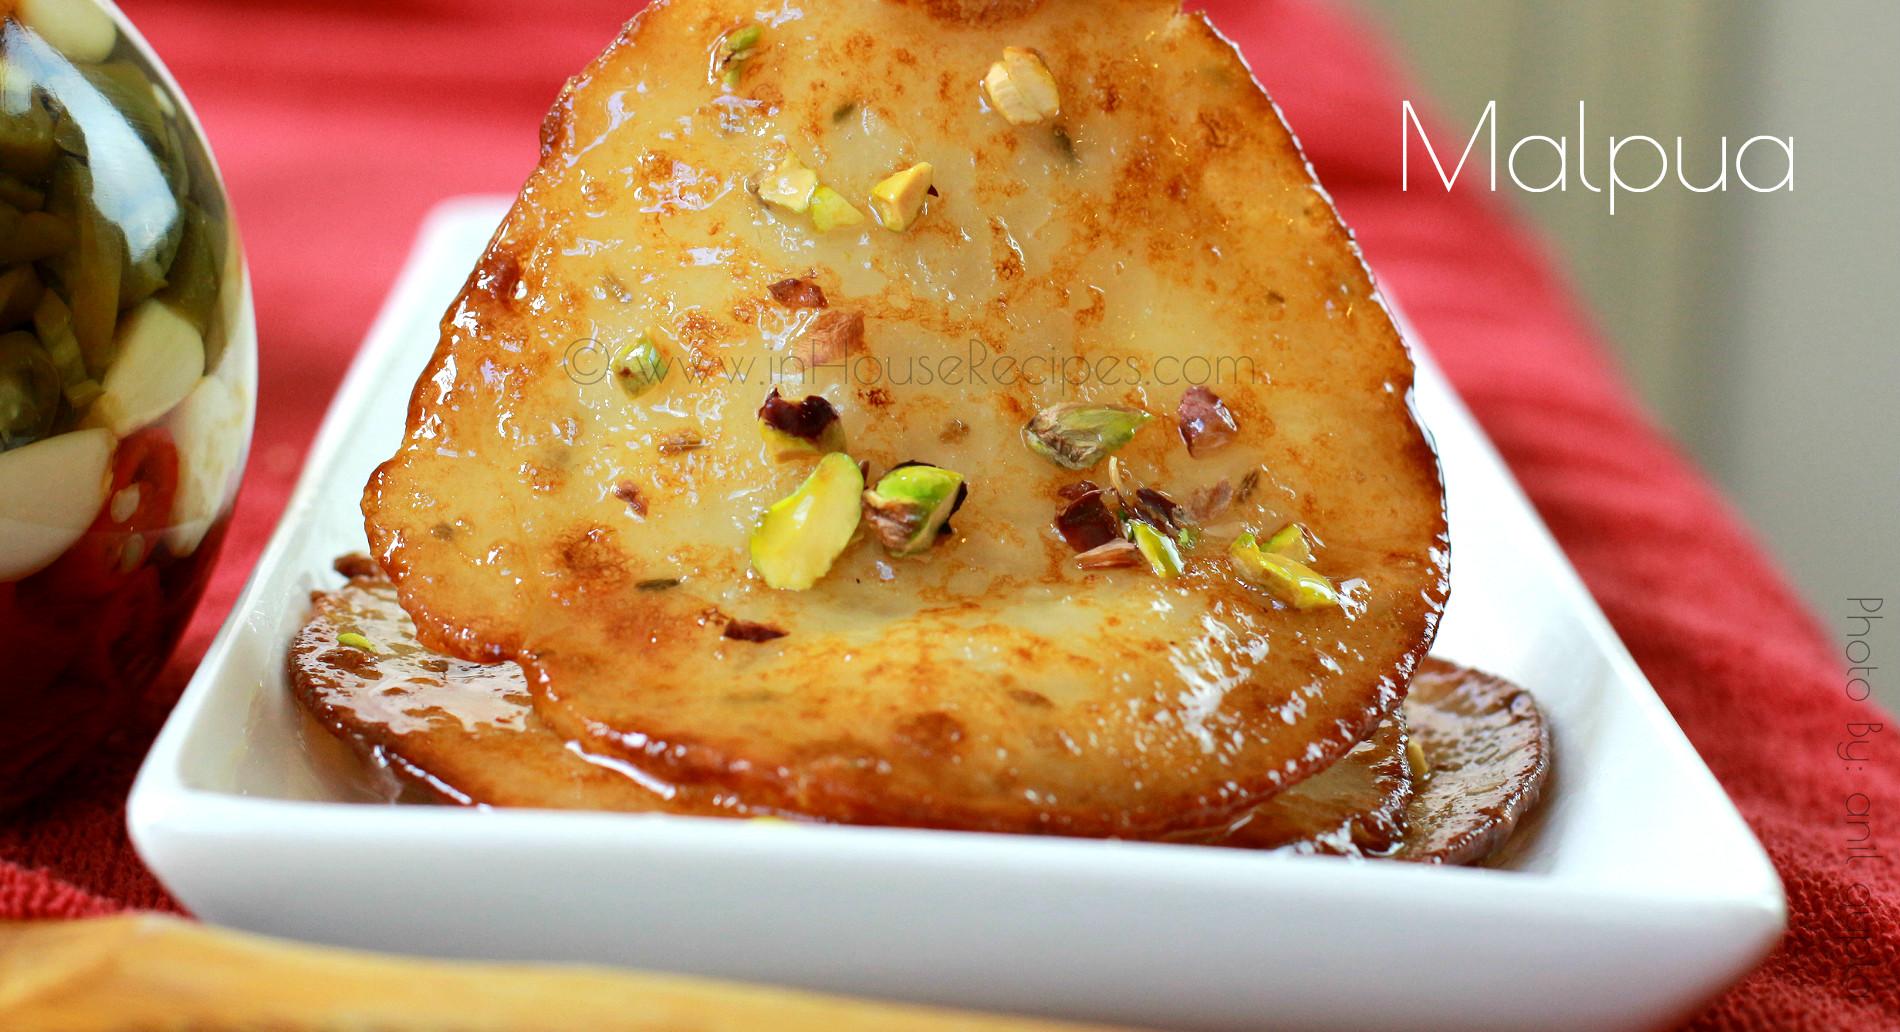 Sweet pancakes from India called Malpua